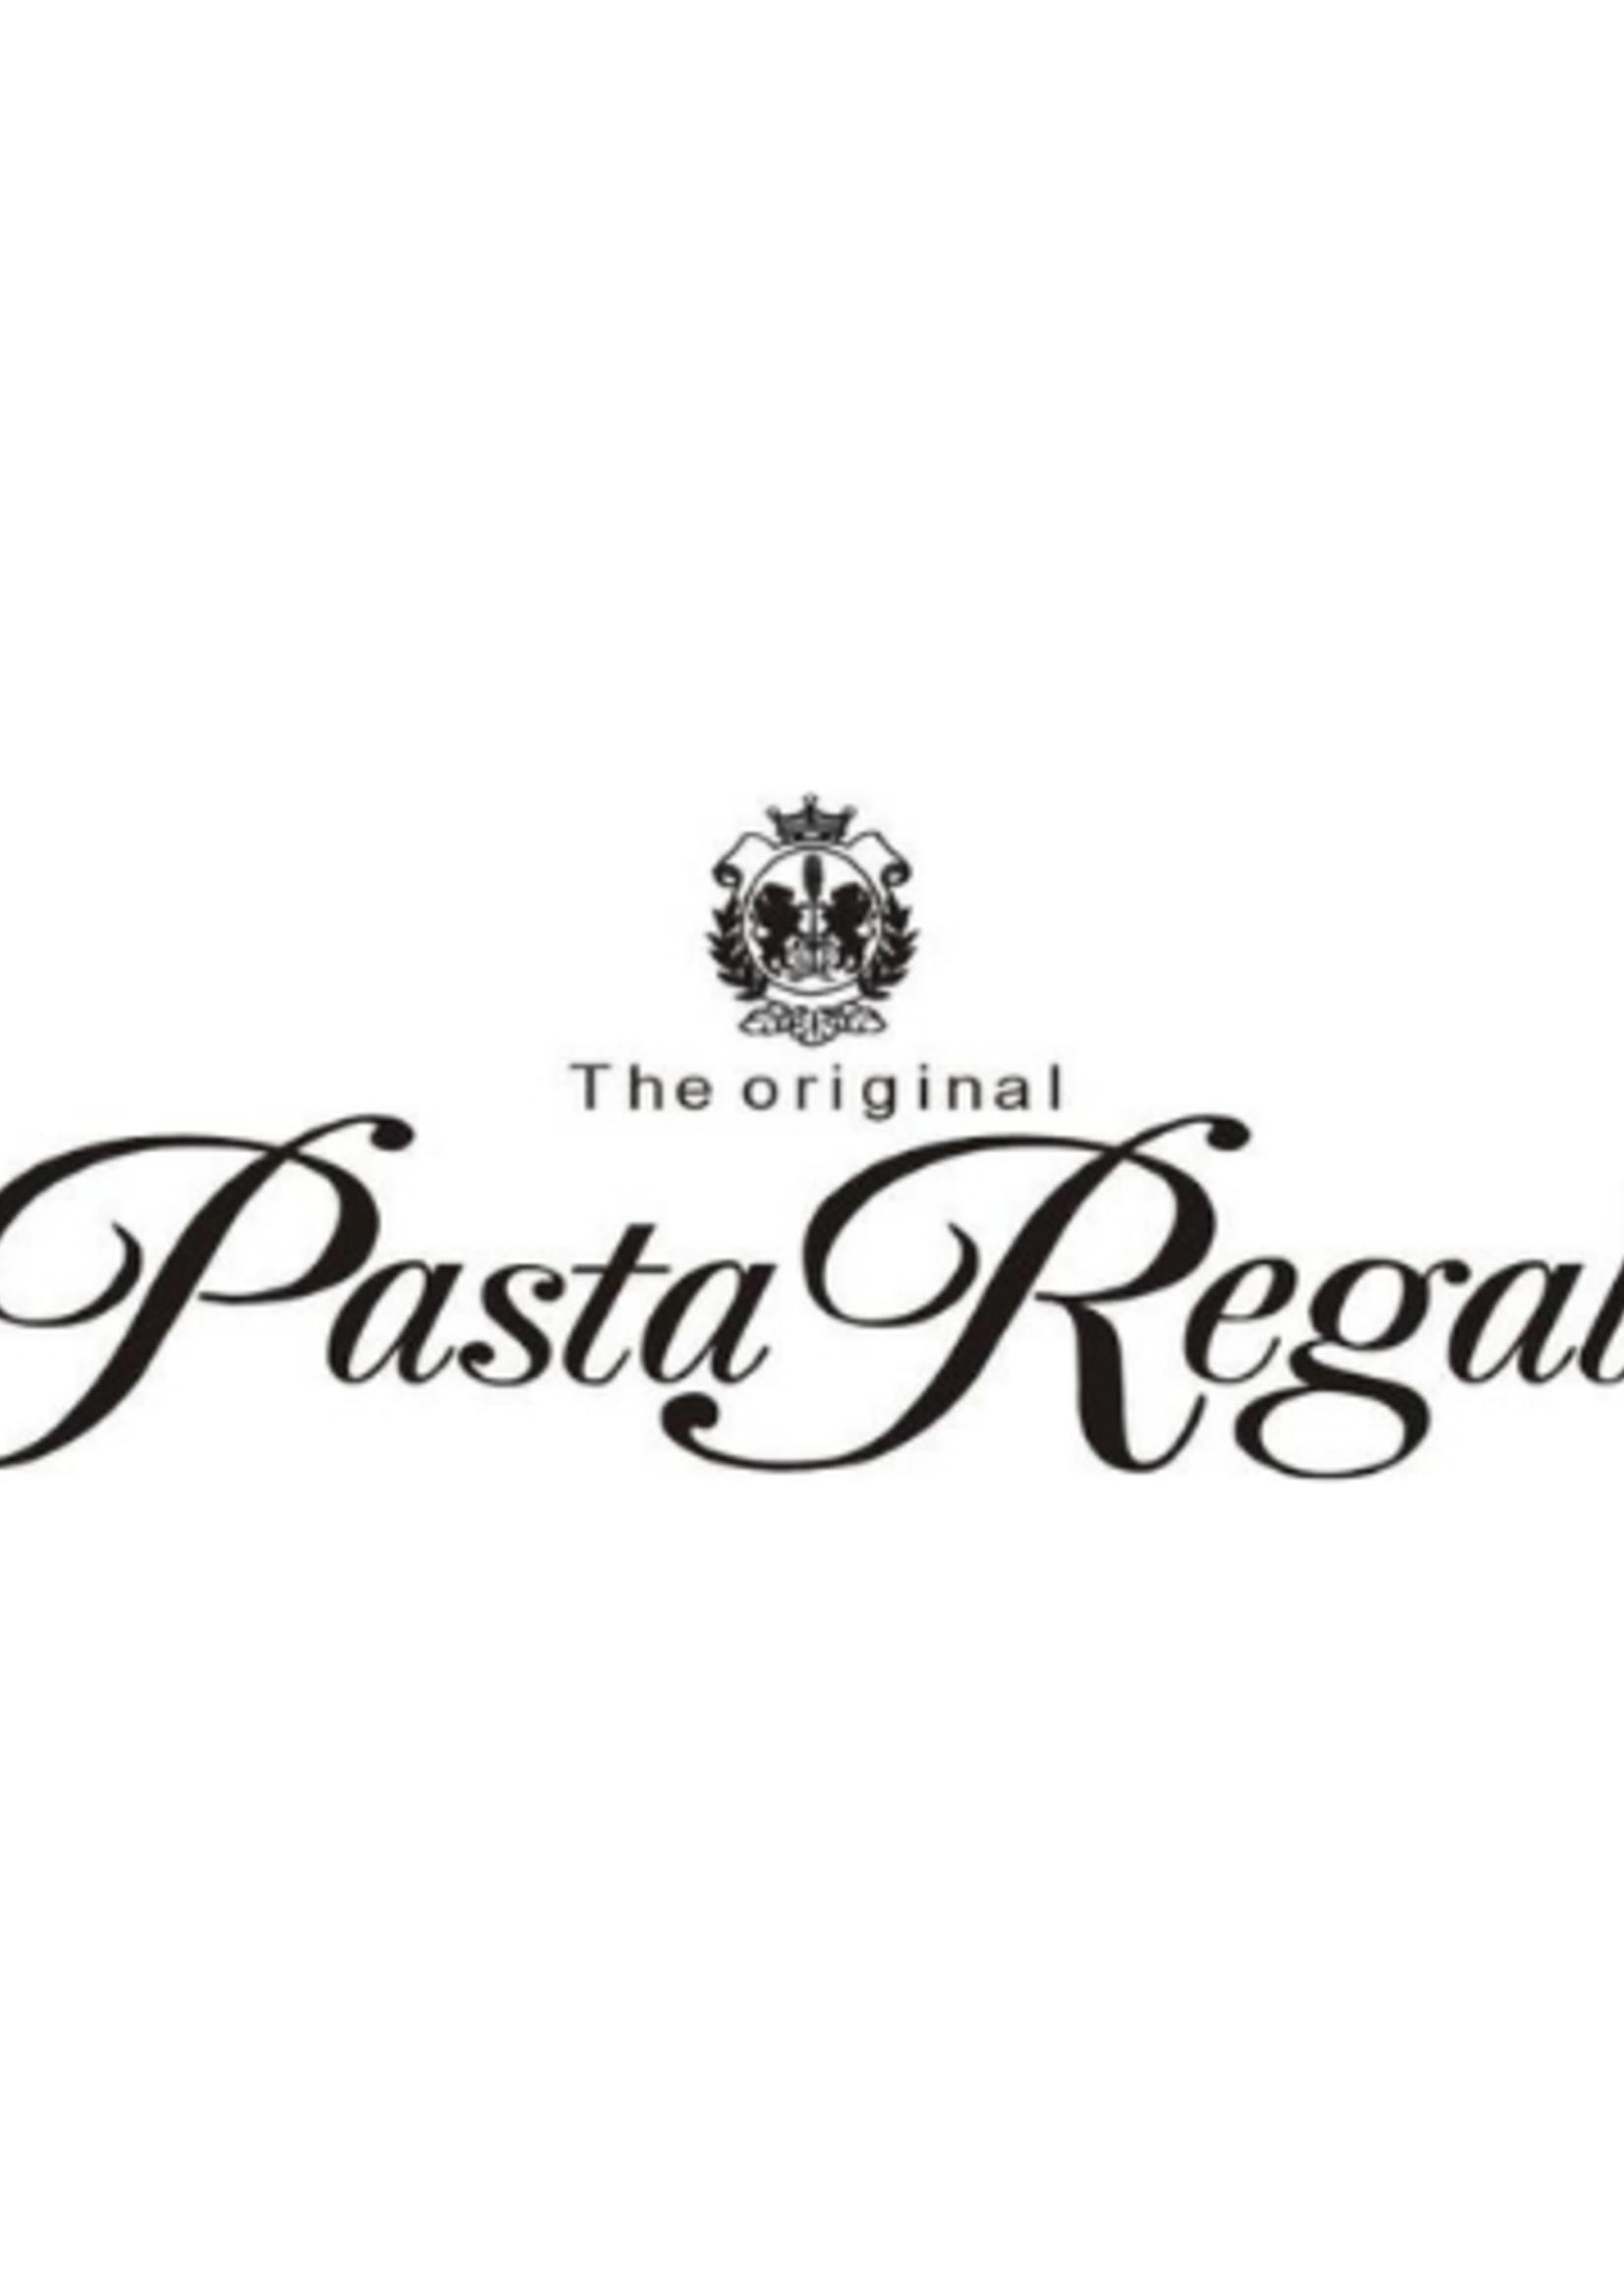 Pasta Regalo Pasta Regalo - Whole Wheat Macaroni